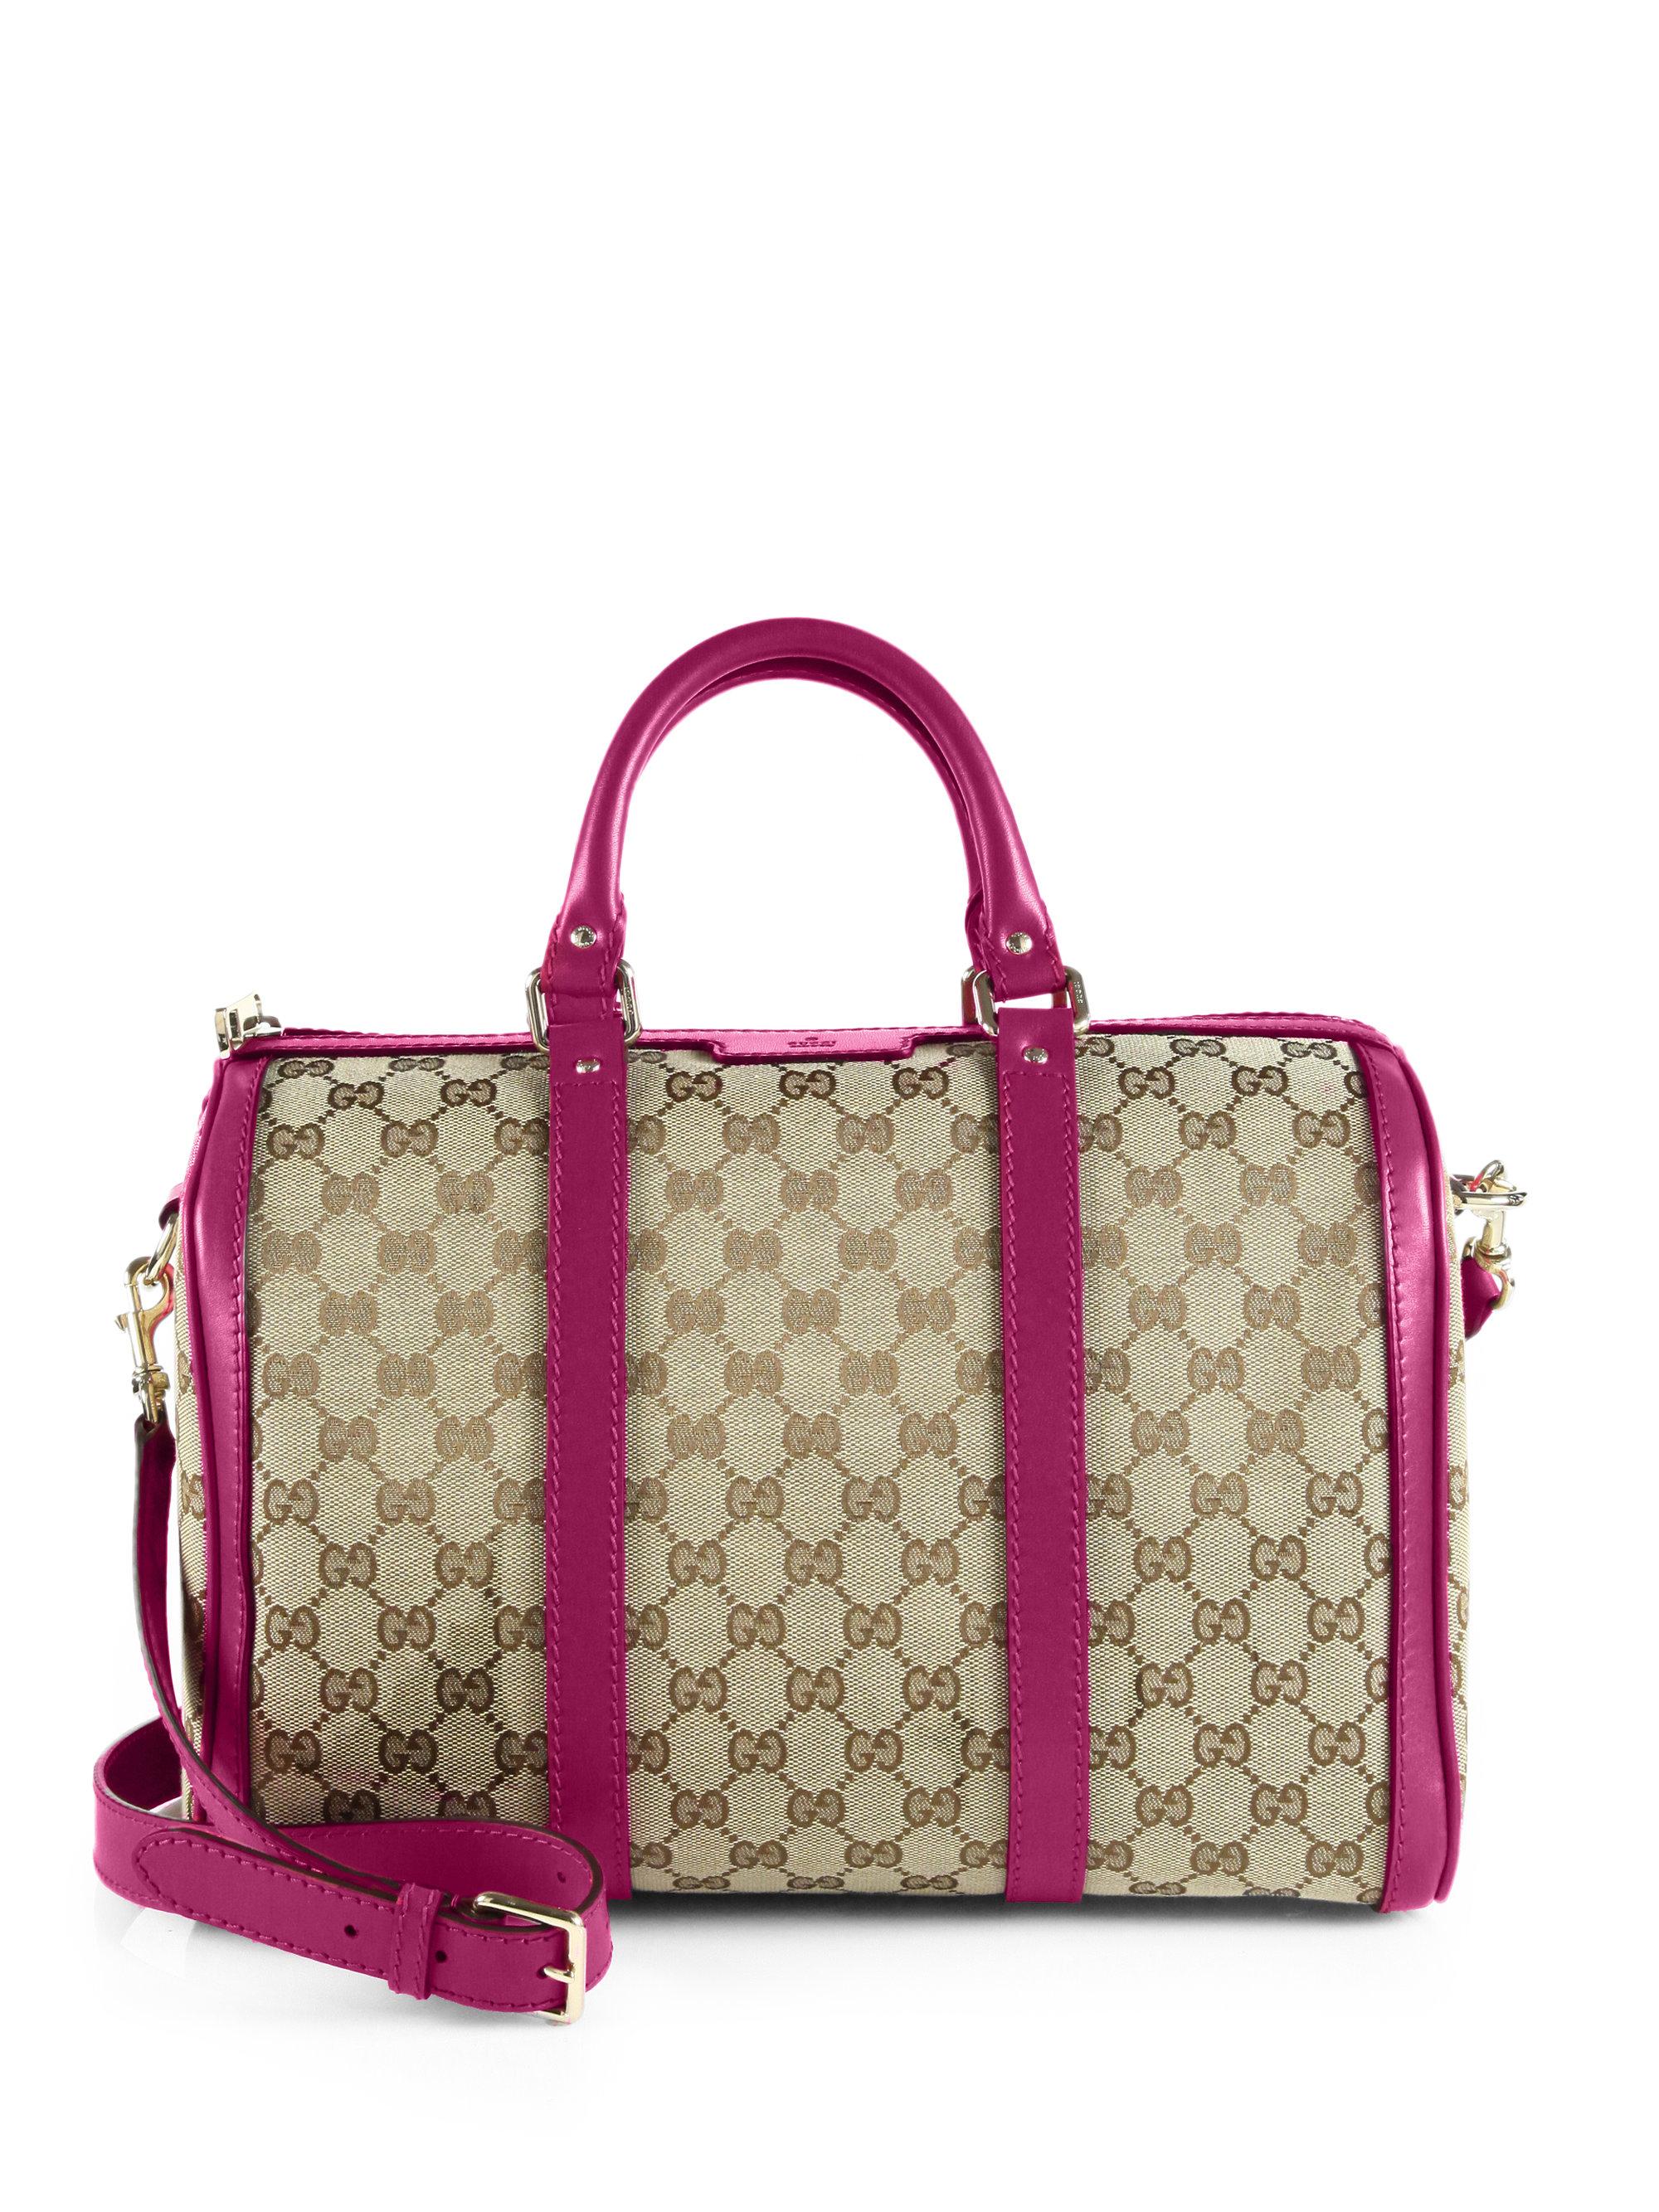 219c8990651e Lyst - Gucci Vintage Web Original GG Canvas Boston Bag in Pink